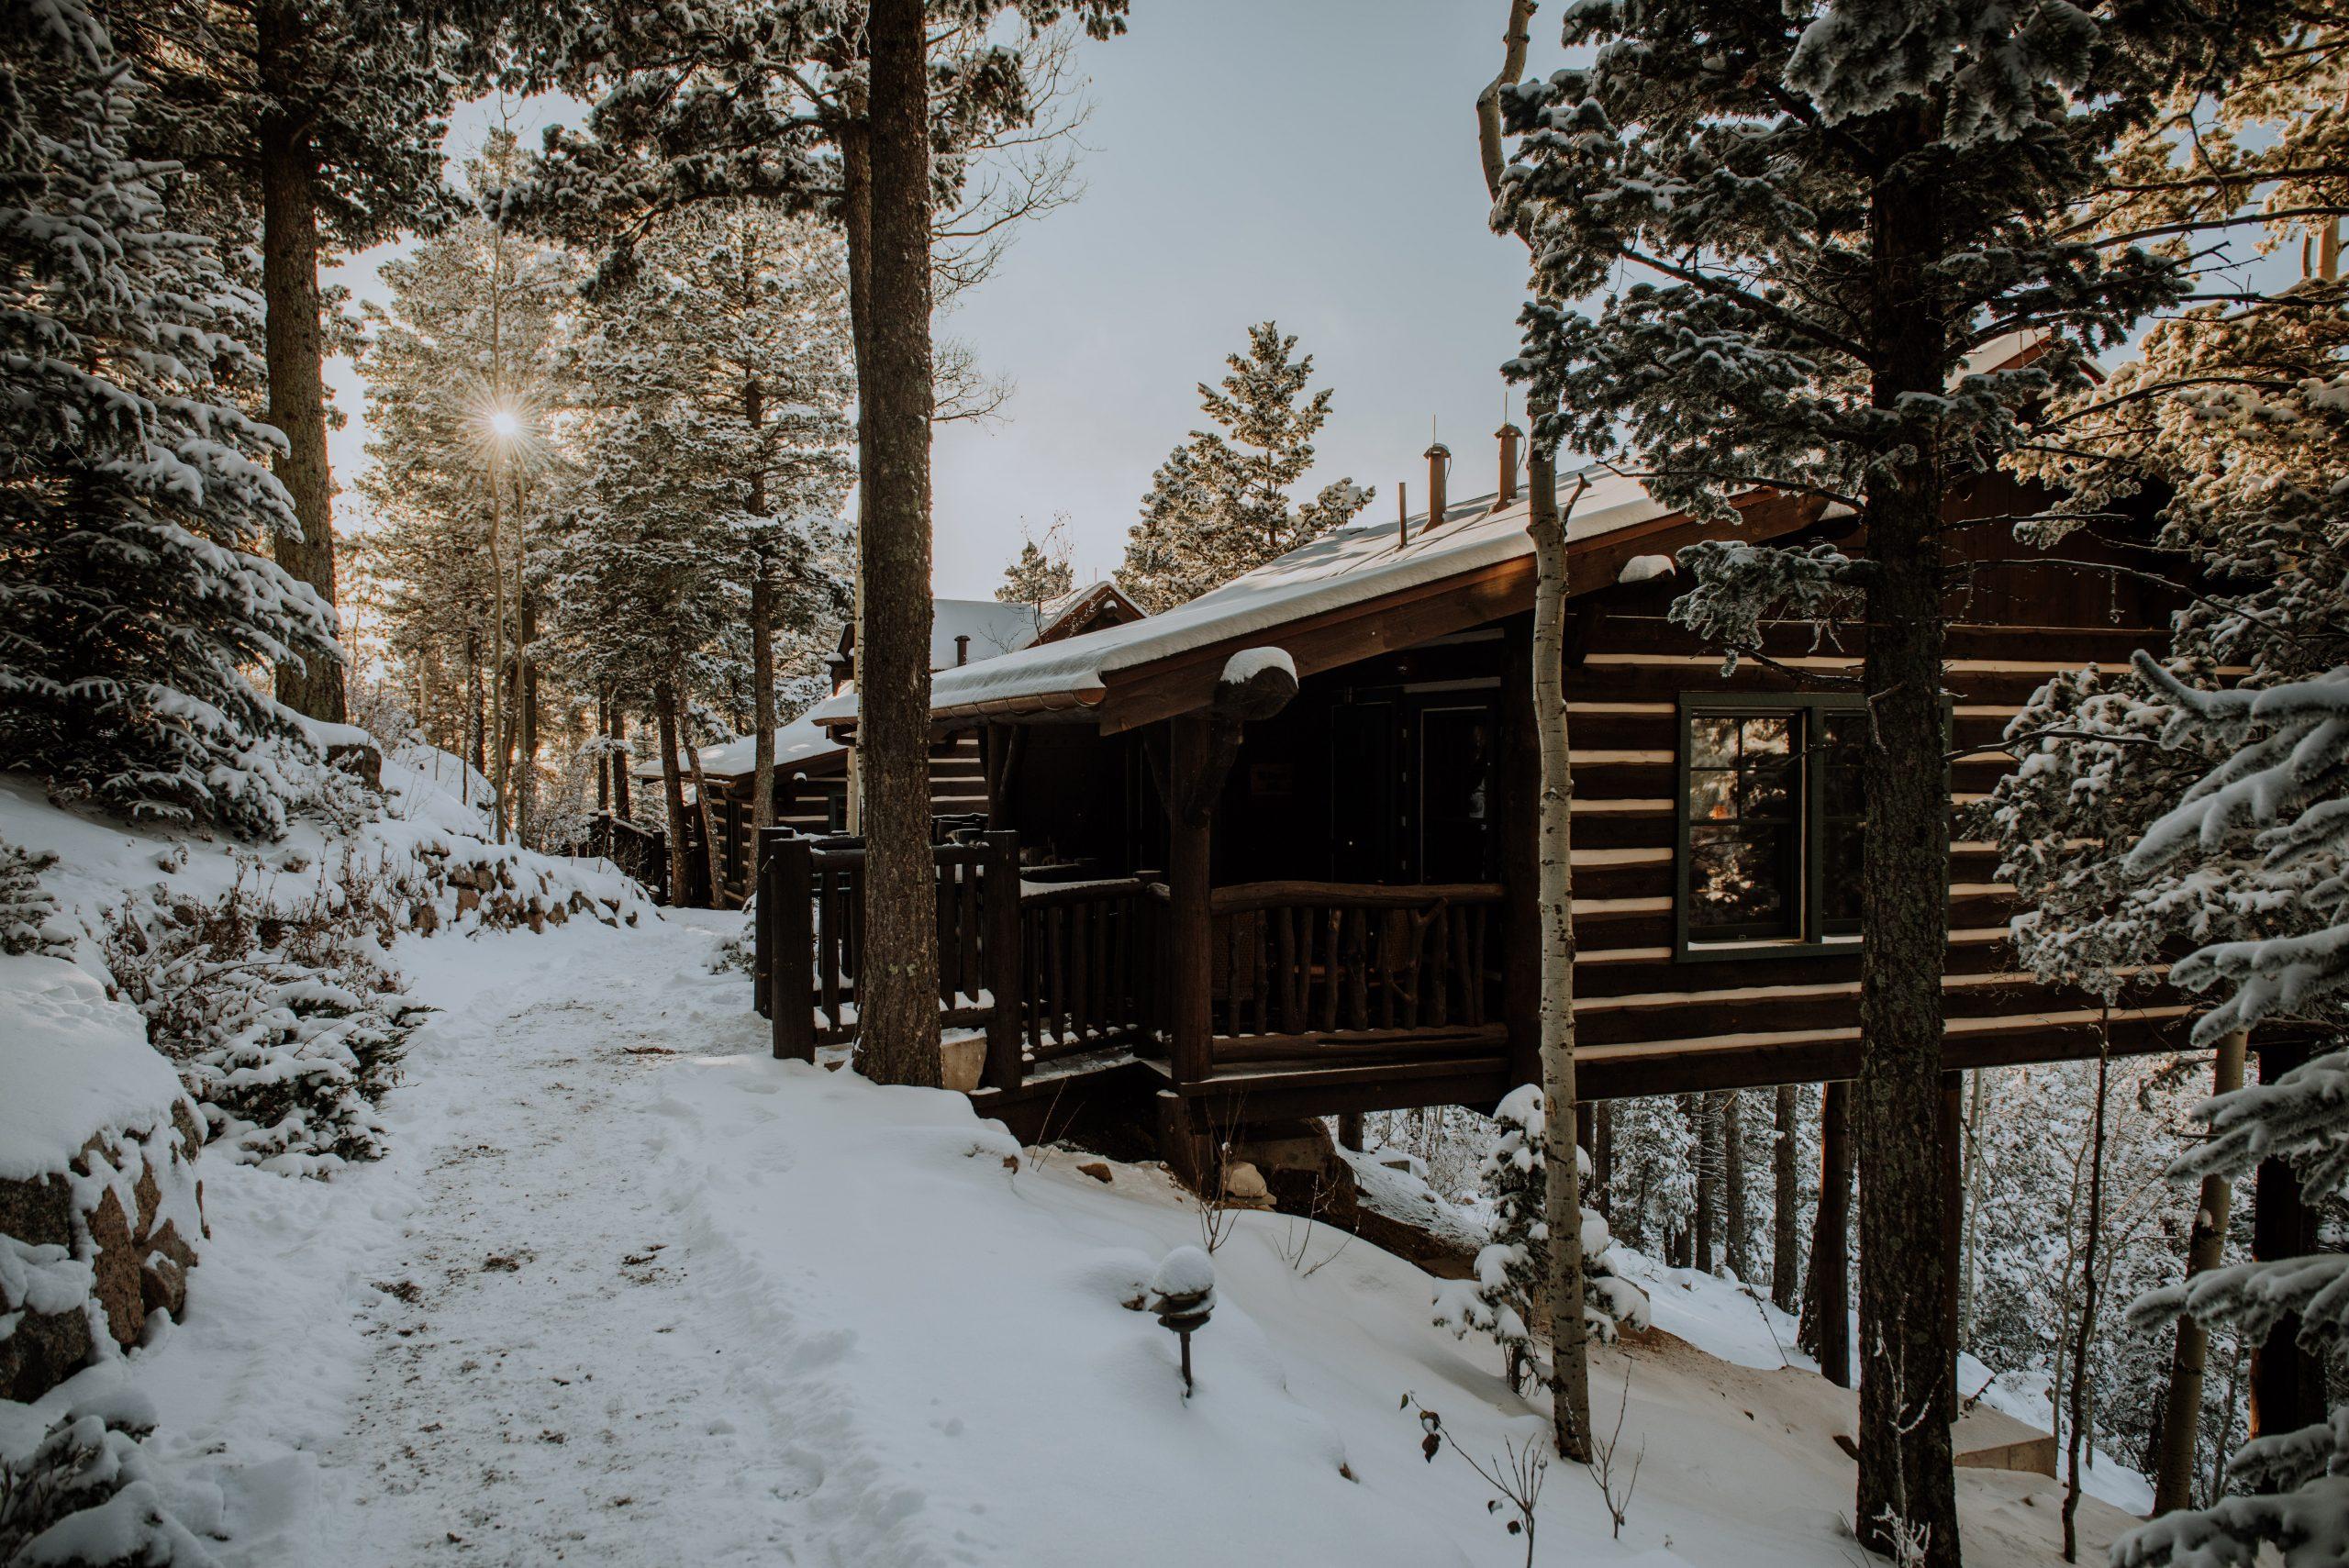 The Broadmoor cloud camp cabins